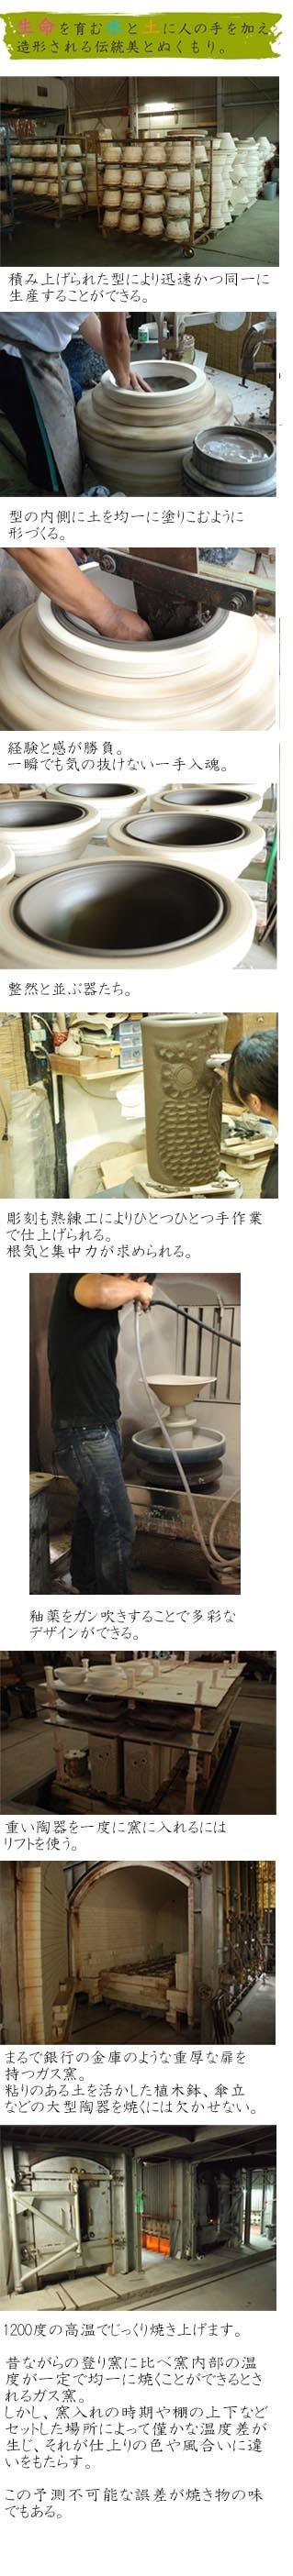 陶芸の信楽焼製造過程